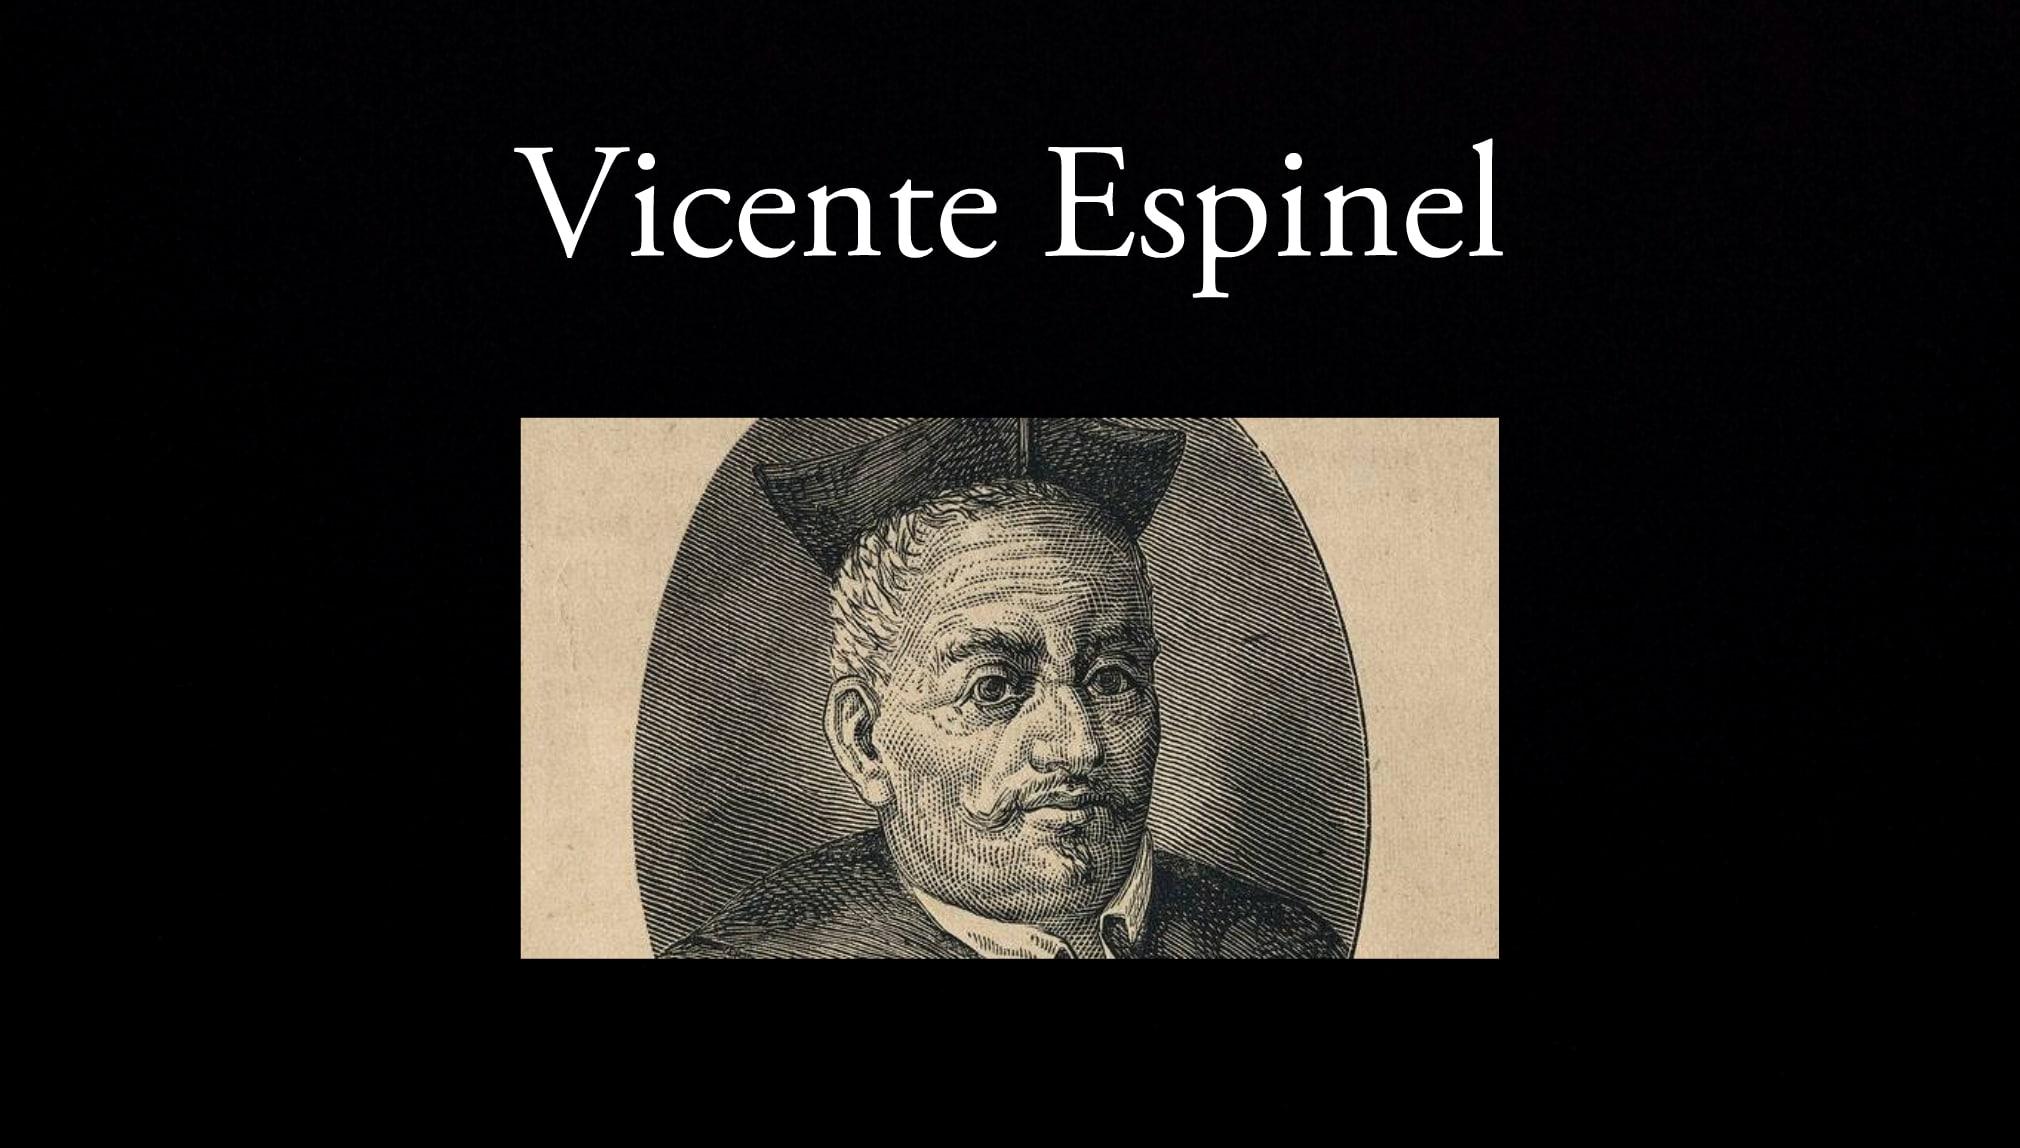 Vicente Espinel.